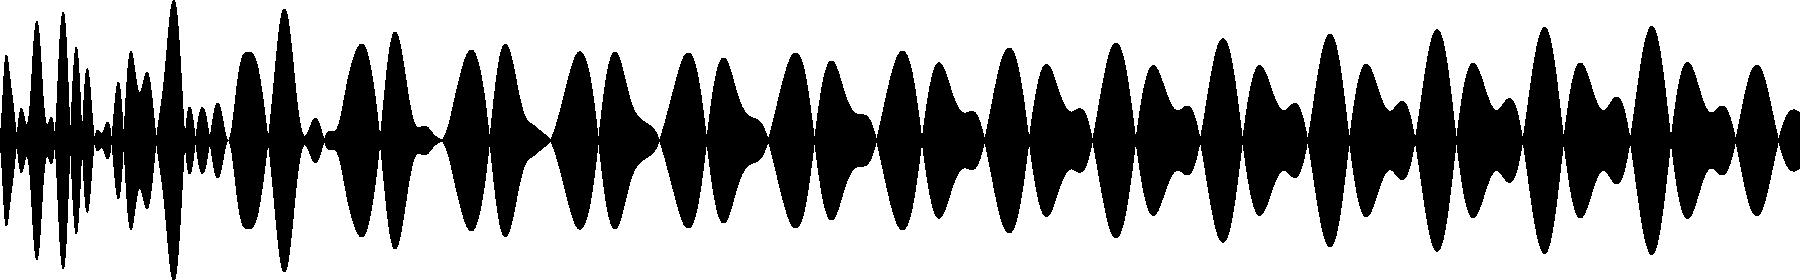 vedh bass cut 021 g